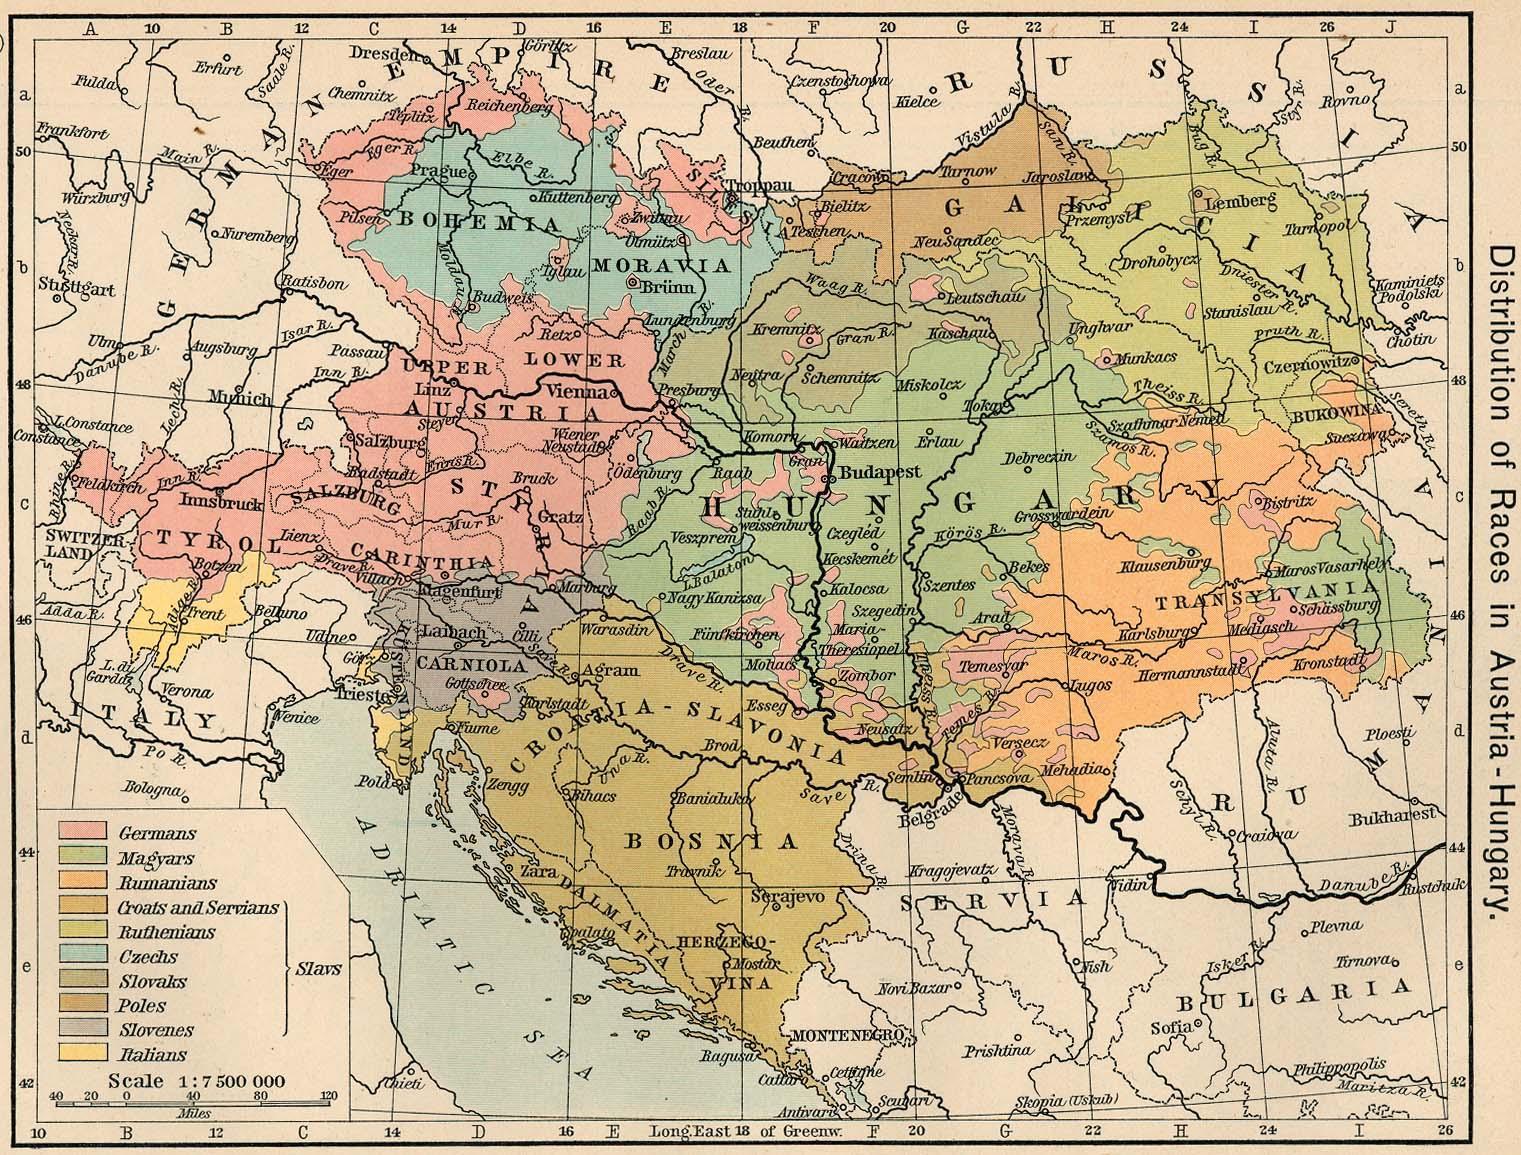 Ostrig Kort 1900 Ostrig Ungarn Kort 1900 Western Europe Europe